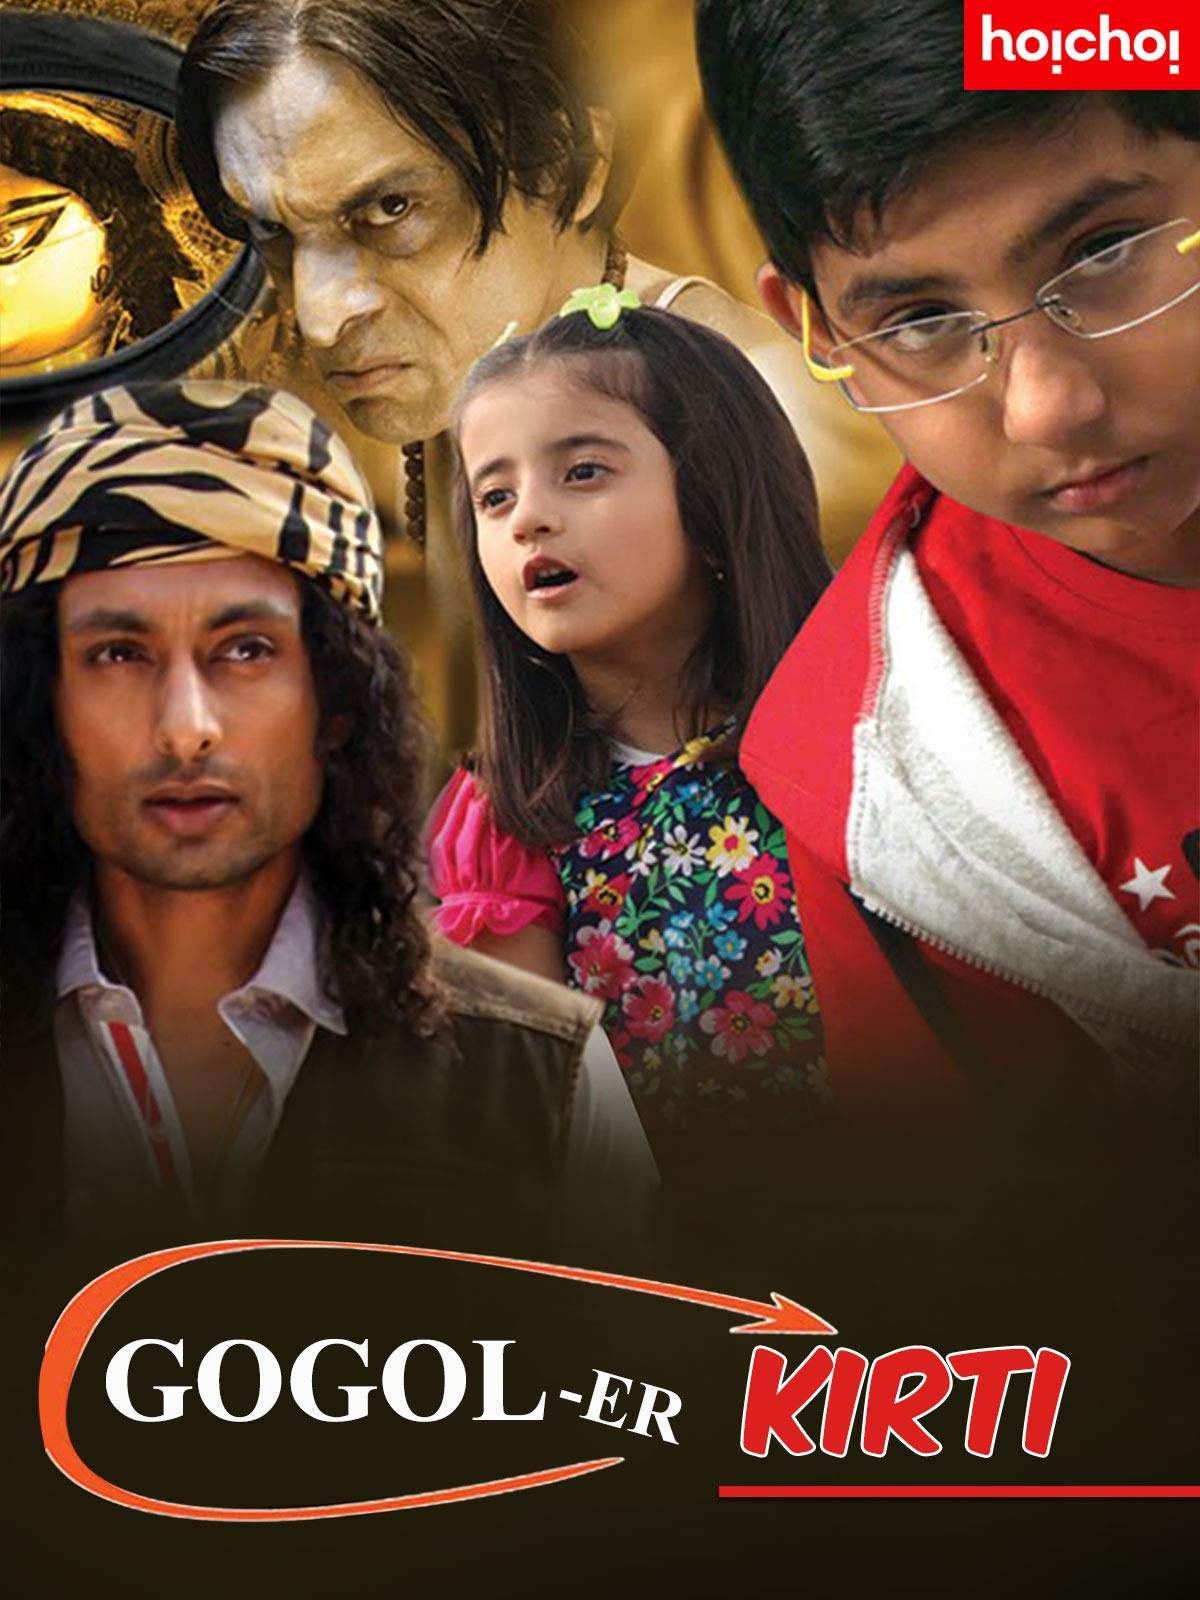 Gogoler Kirti (2014) Bengali 720p HEVC HDRip x265 AAC Full Bengali Movie 600MB Download